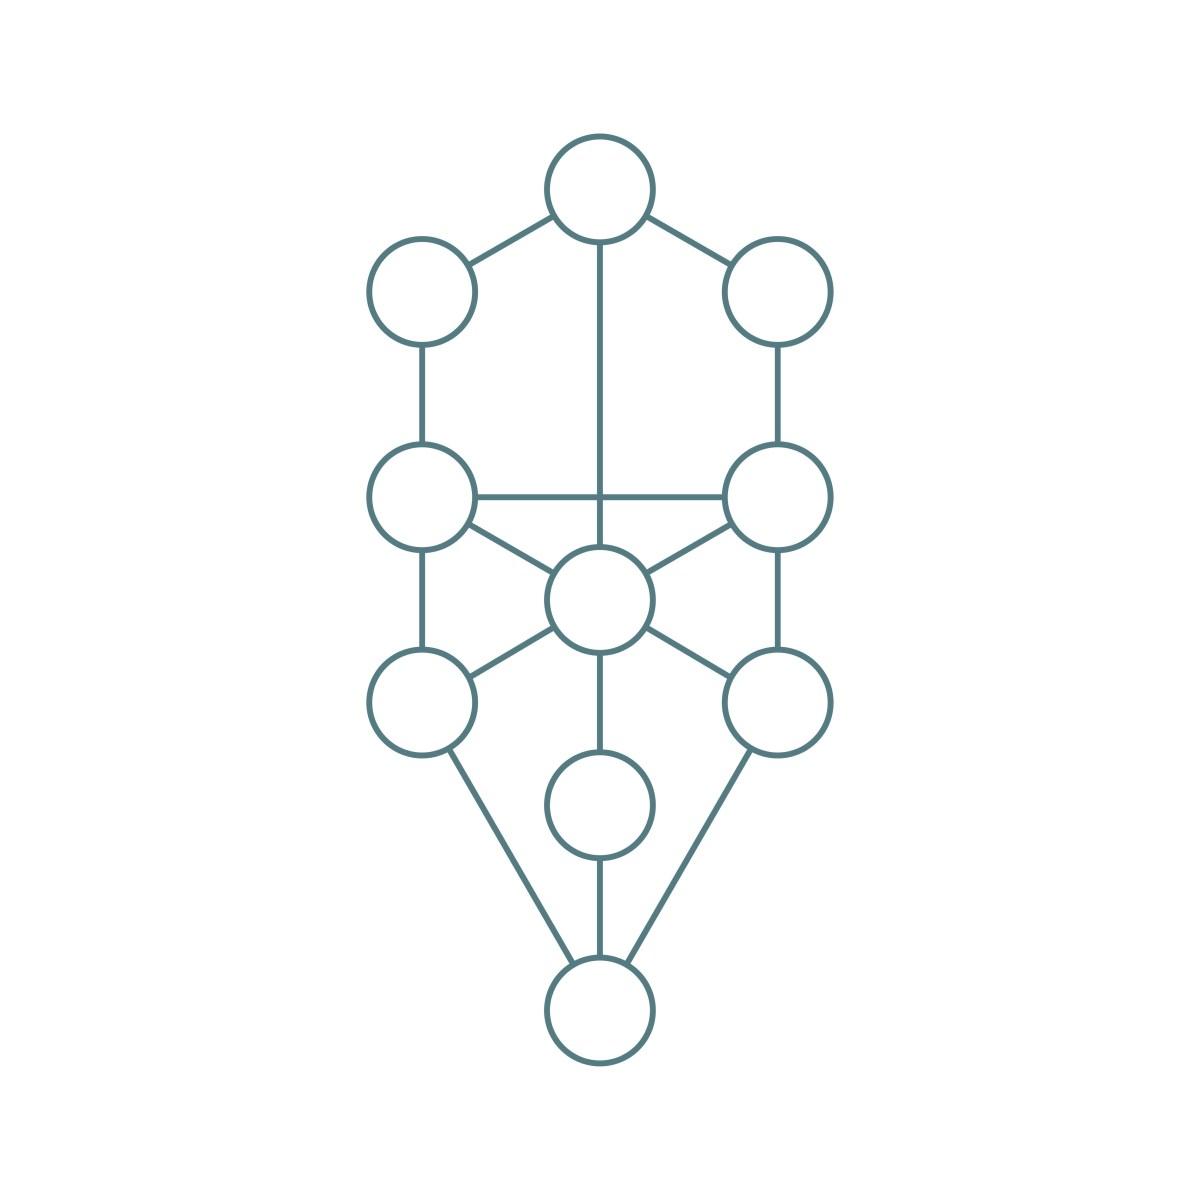 Laminated Grid Four